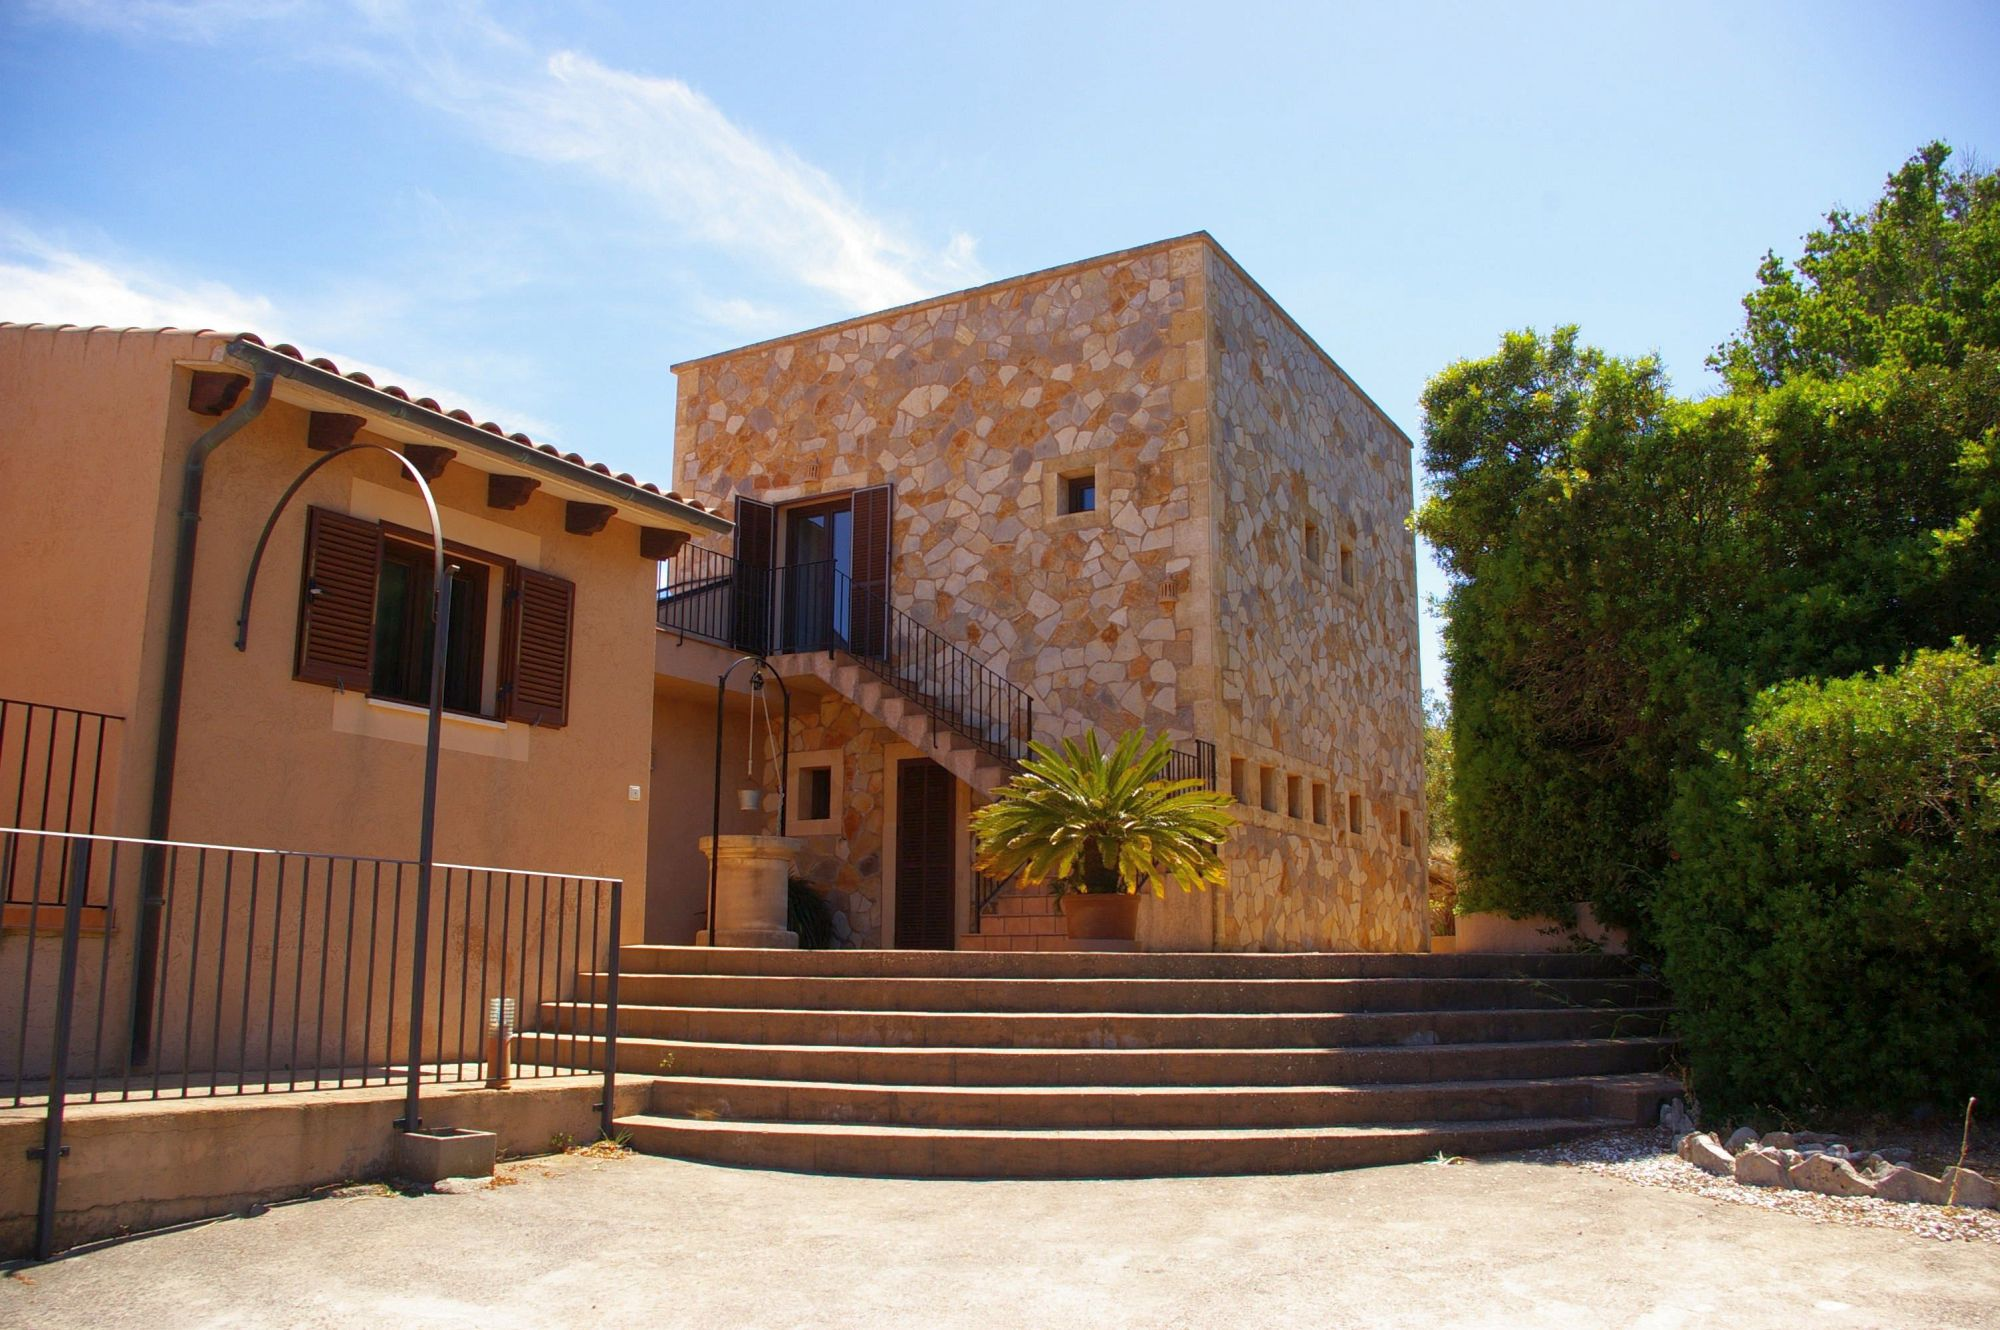 Finca El Cel - Treppe zum Hauseingang